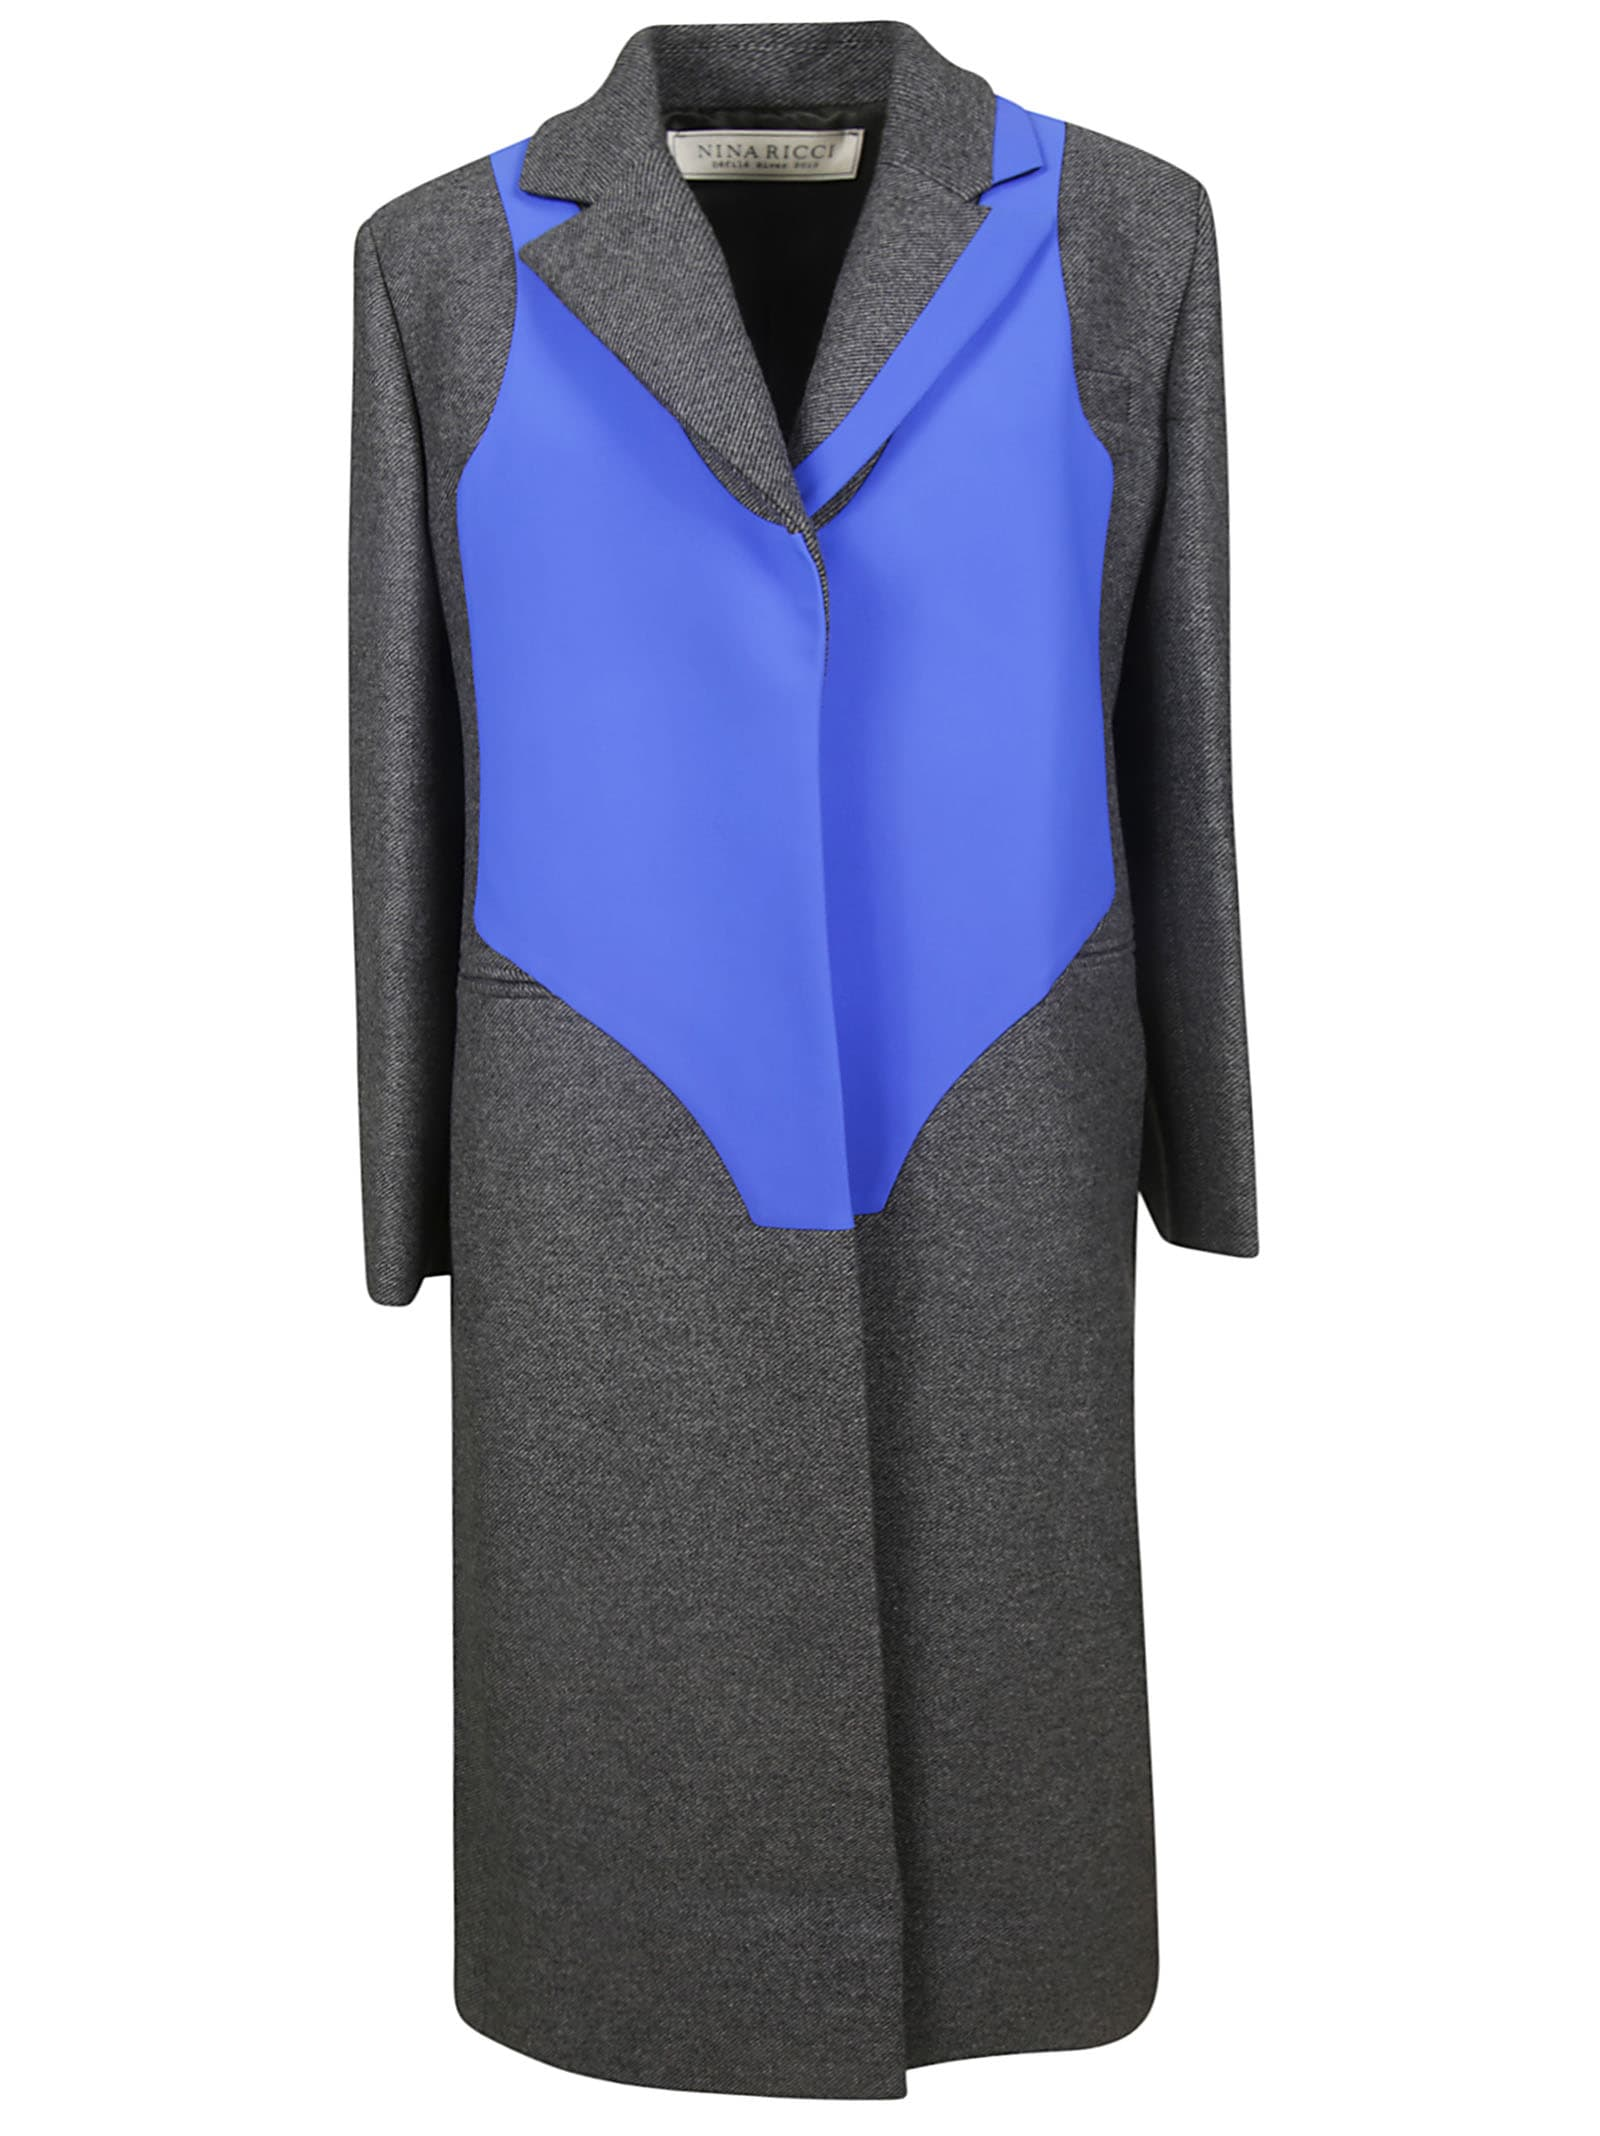 Photo of  Nina Ricci Concealed Coat- shop Nina Ricci jackets online sales